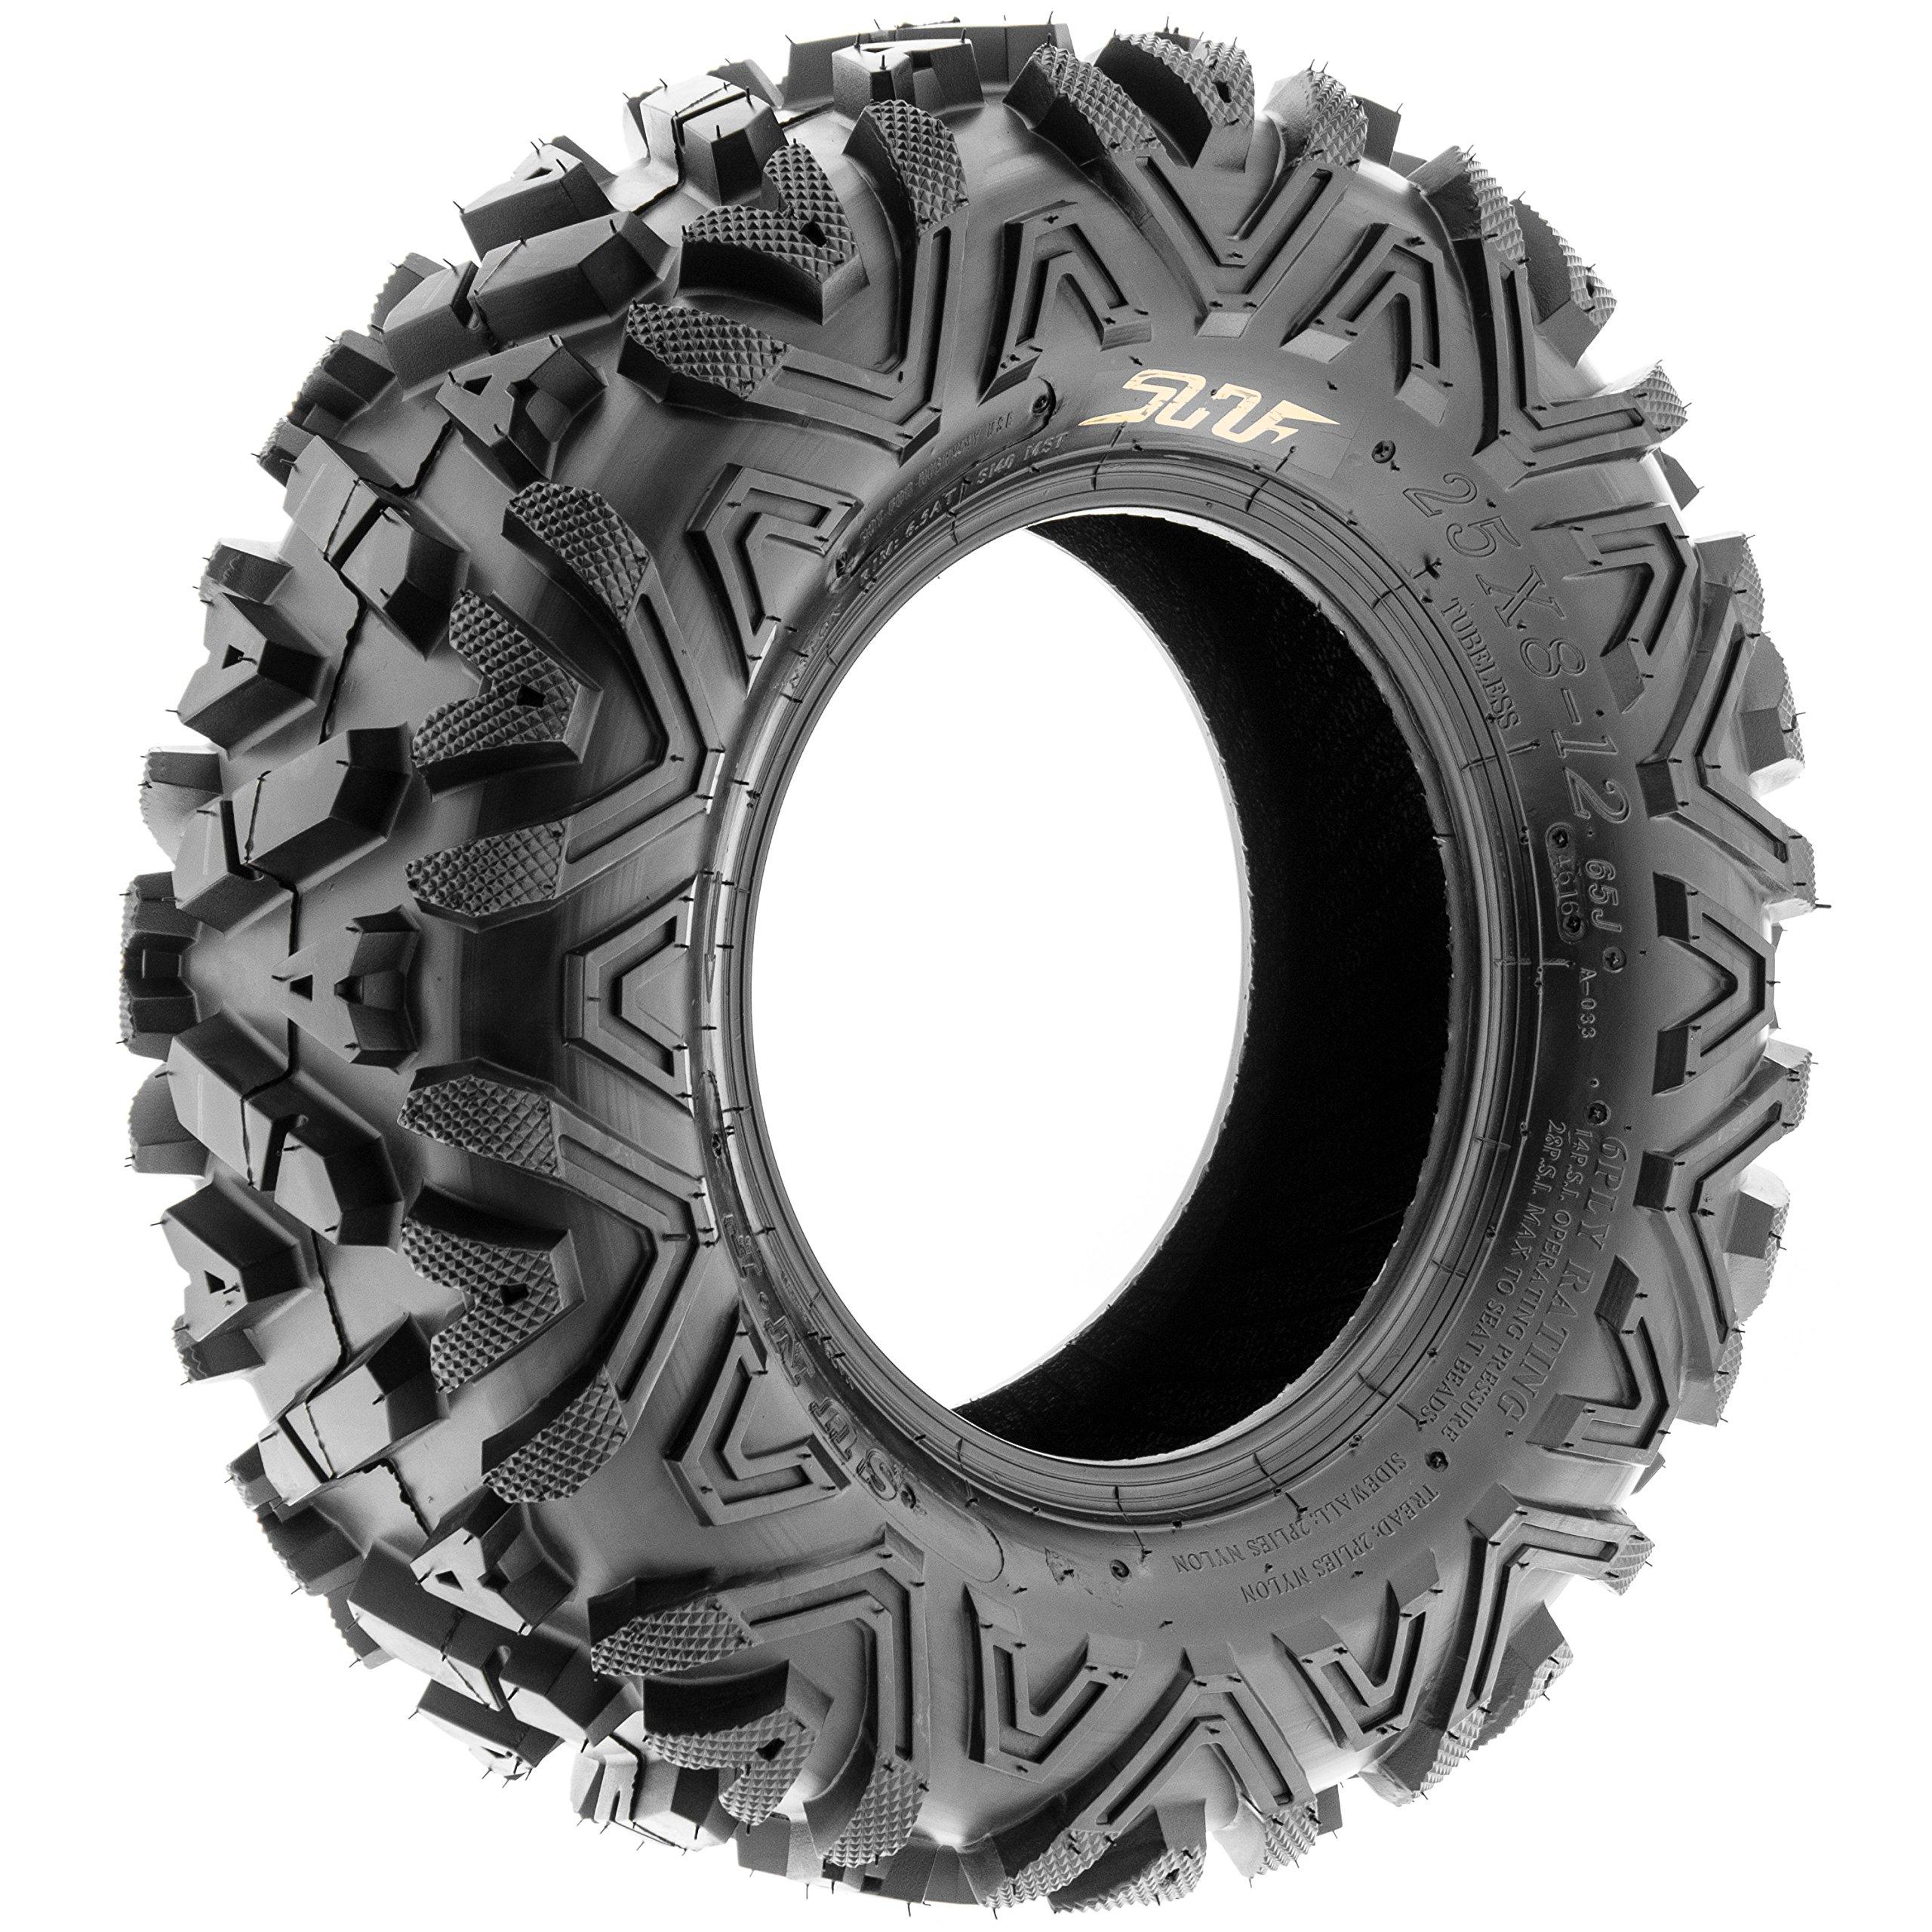 SunF A033 ATV/UTV Tire 28x9-12 Front & 28x11-12 Rear, Set of 4 by SunF (Image #5)